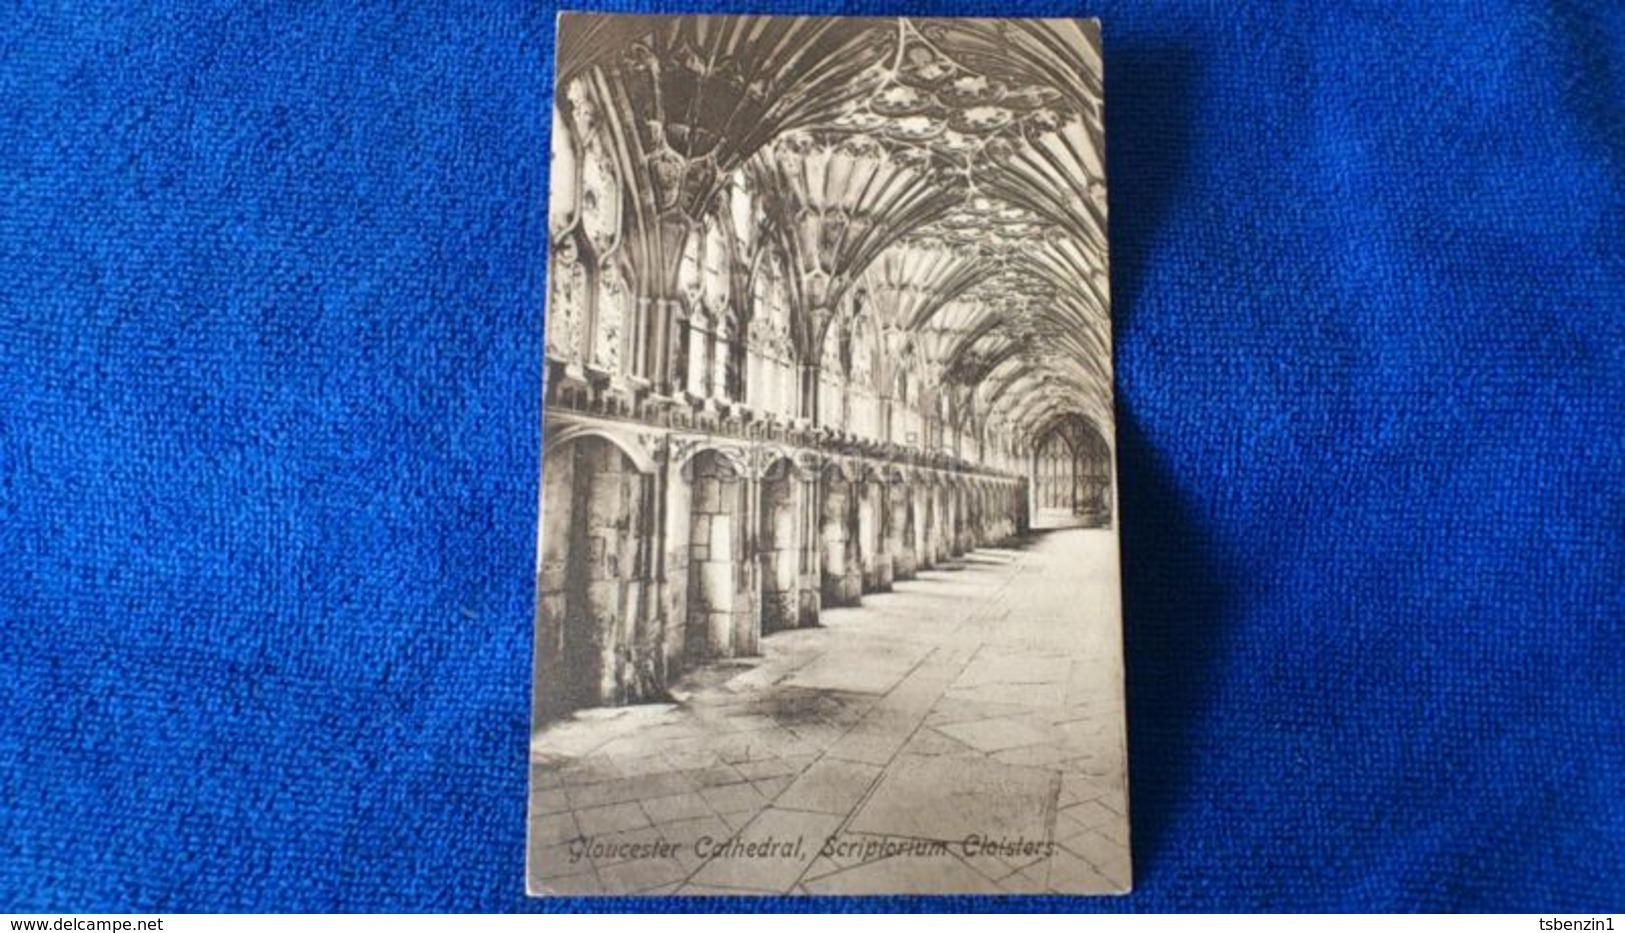 Gloucester Cathedral Scriptorium Cloister England - Gloucester